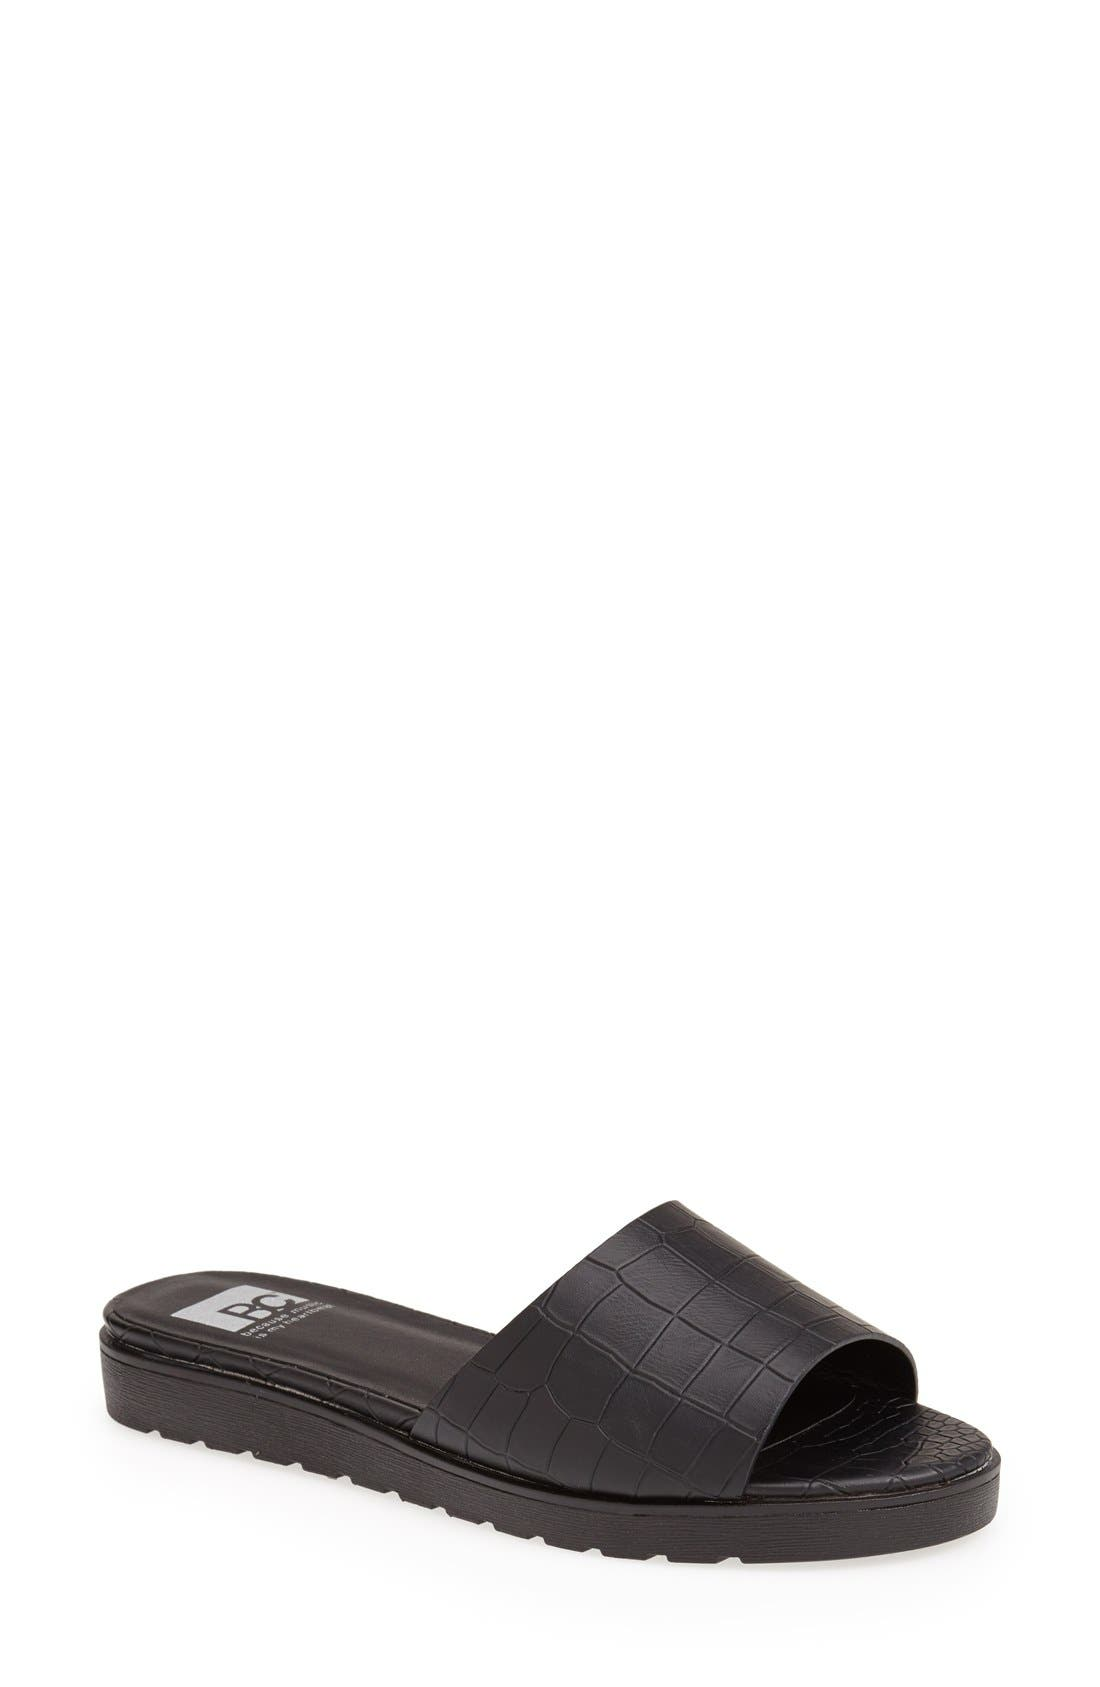 Alternate Image 1 Selected - BC Footwear 'Inspiration' Slide Sandal (Women)